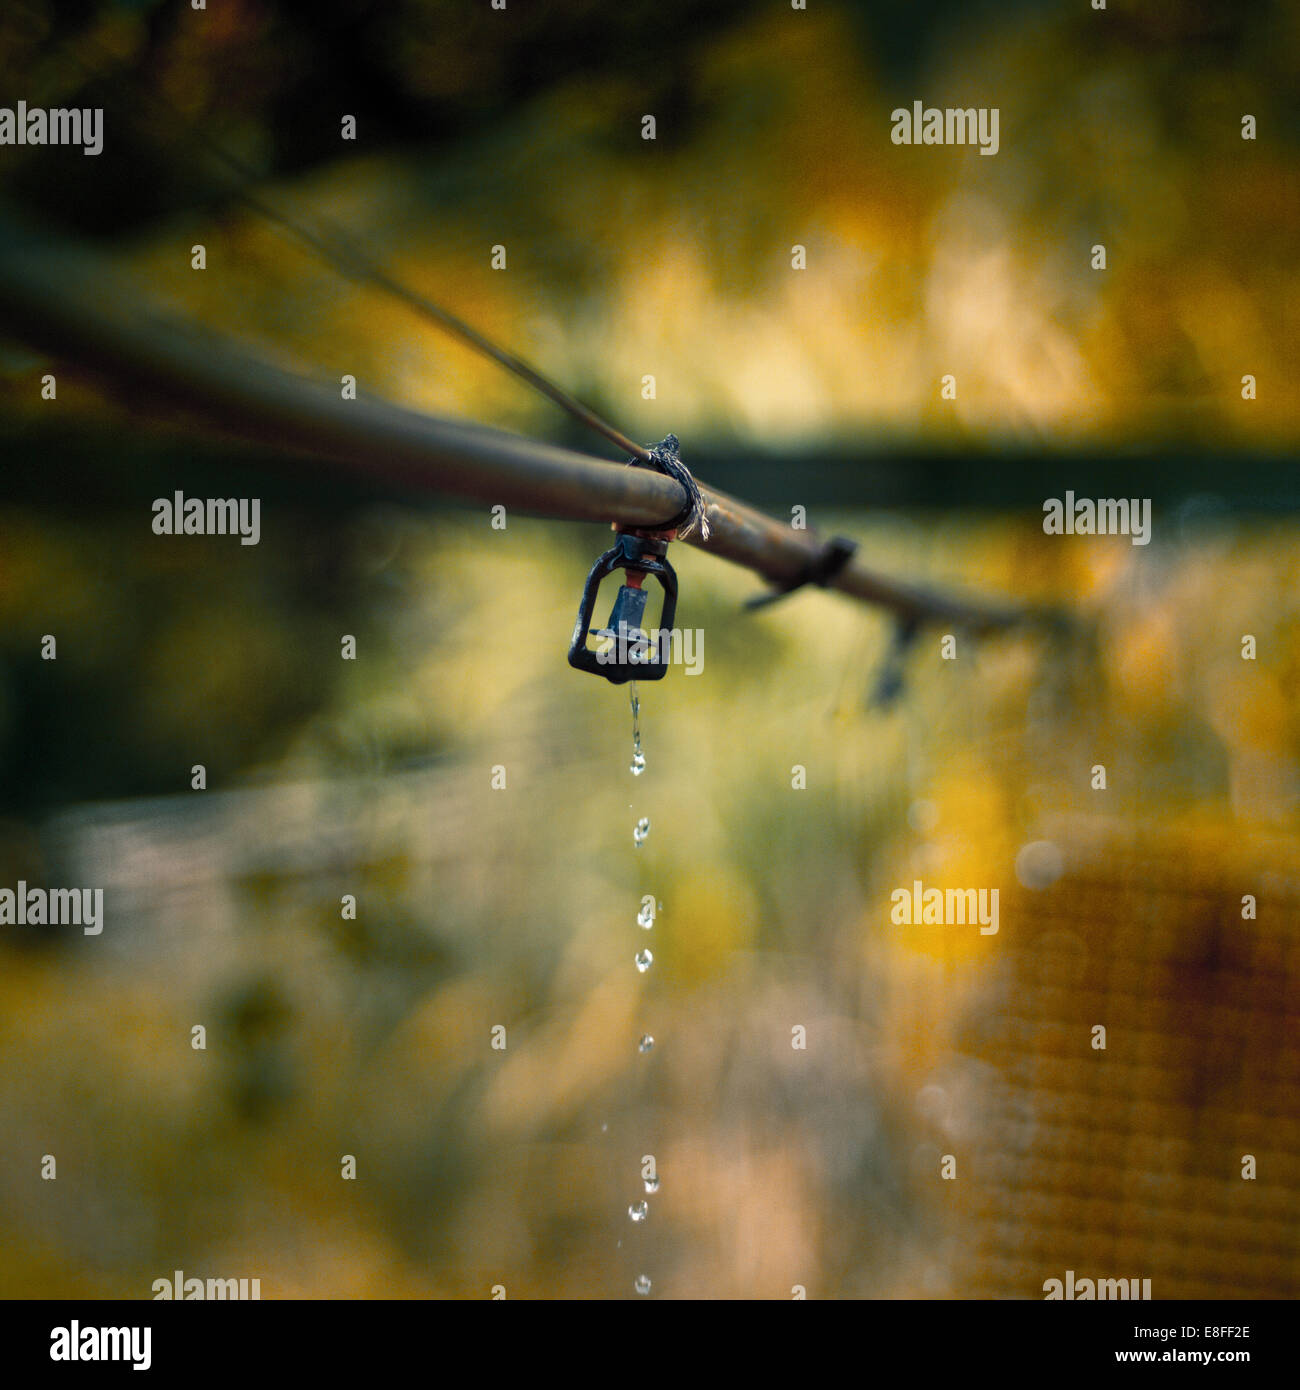 Nahaufnahme von Outdoor-sprinkler Stockfoto